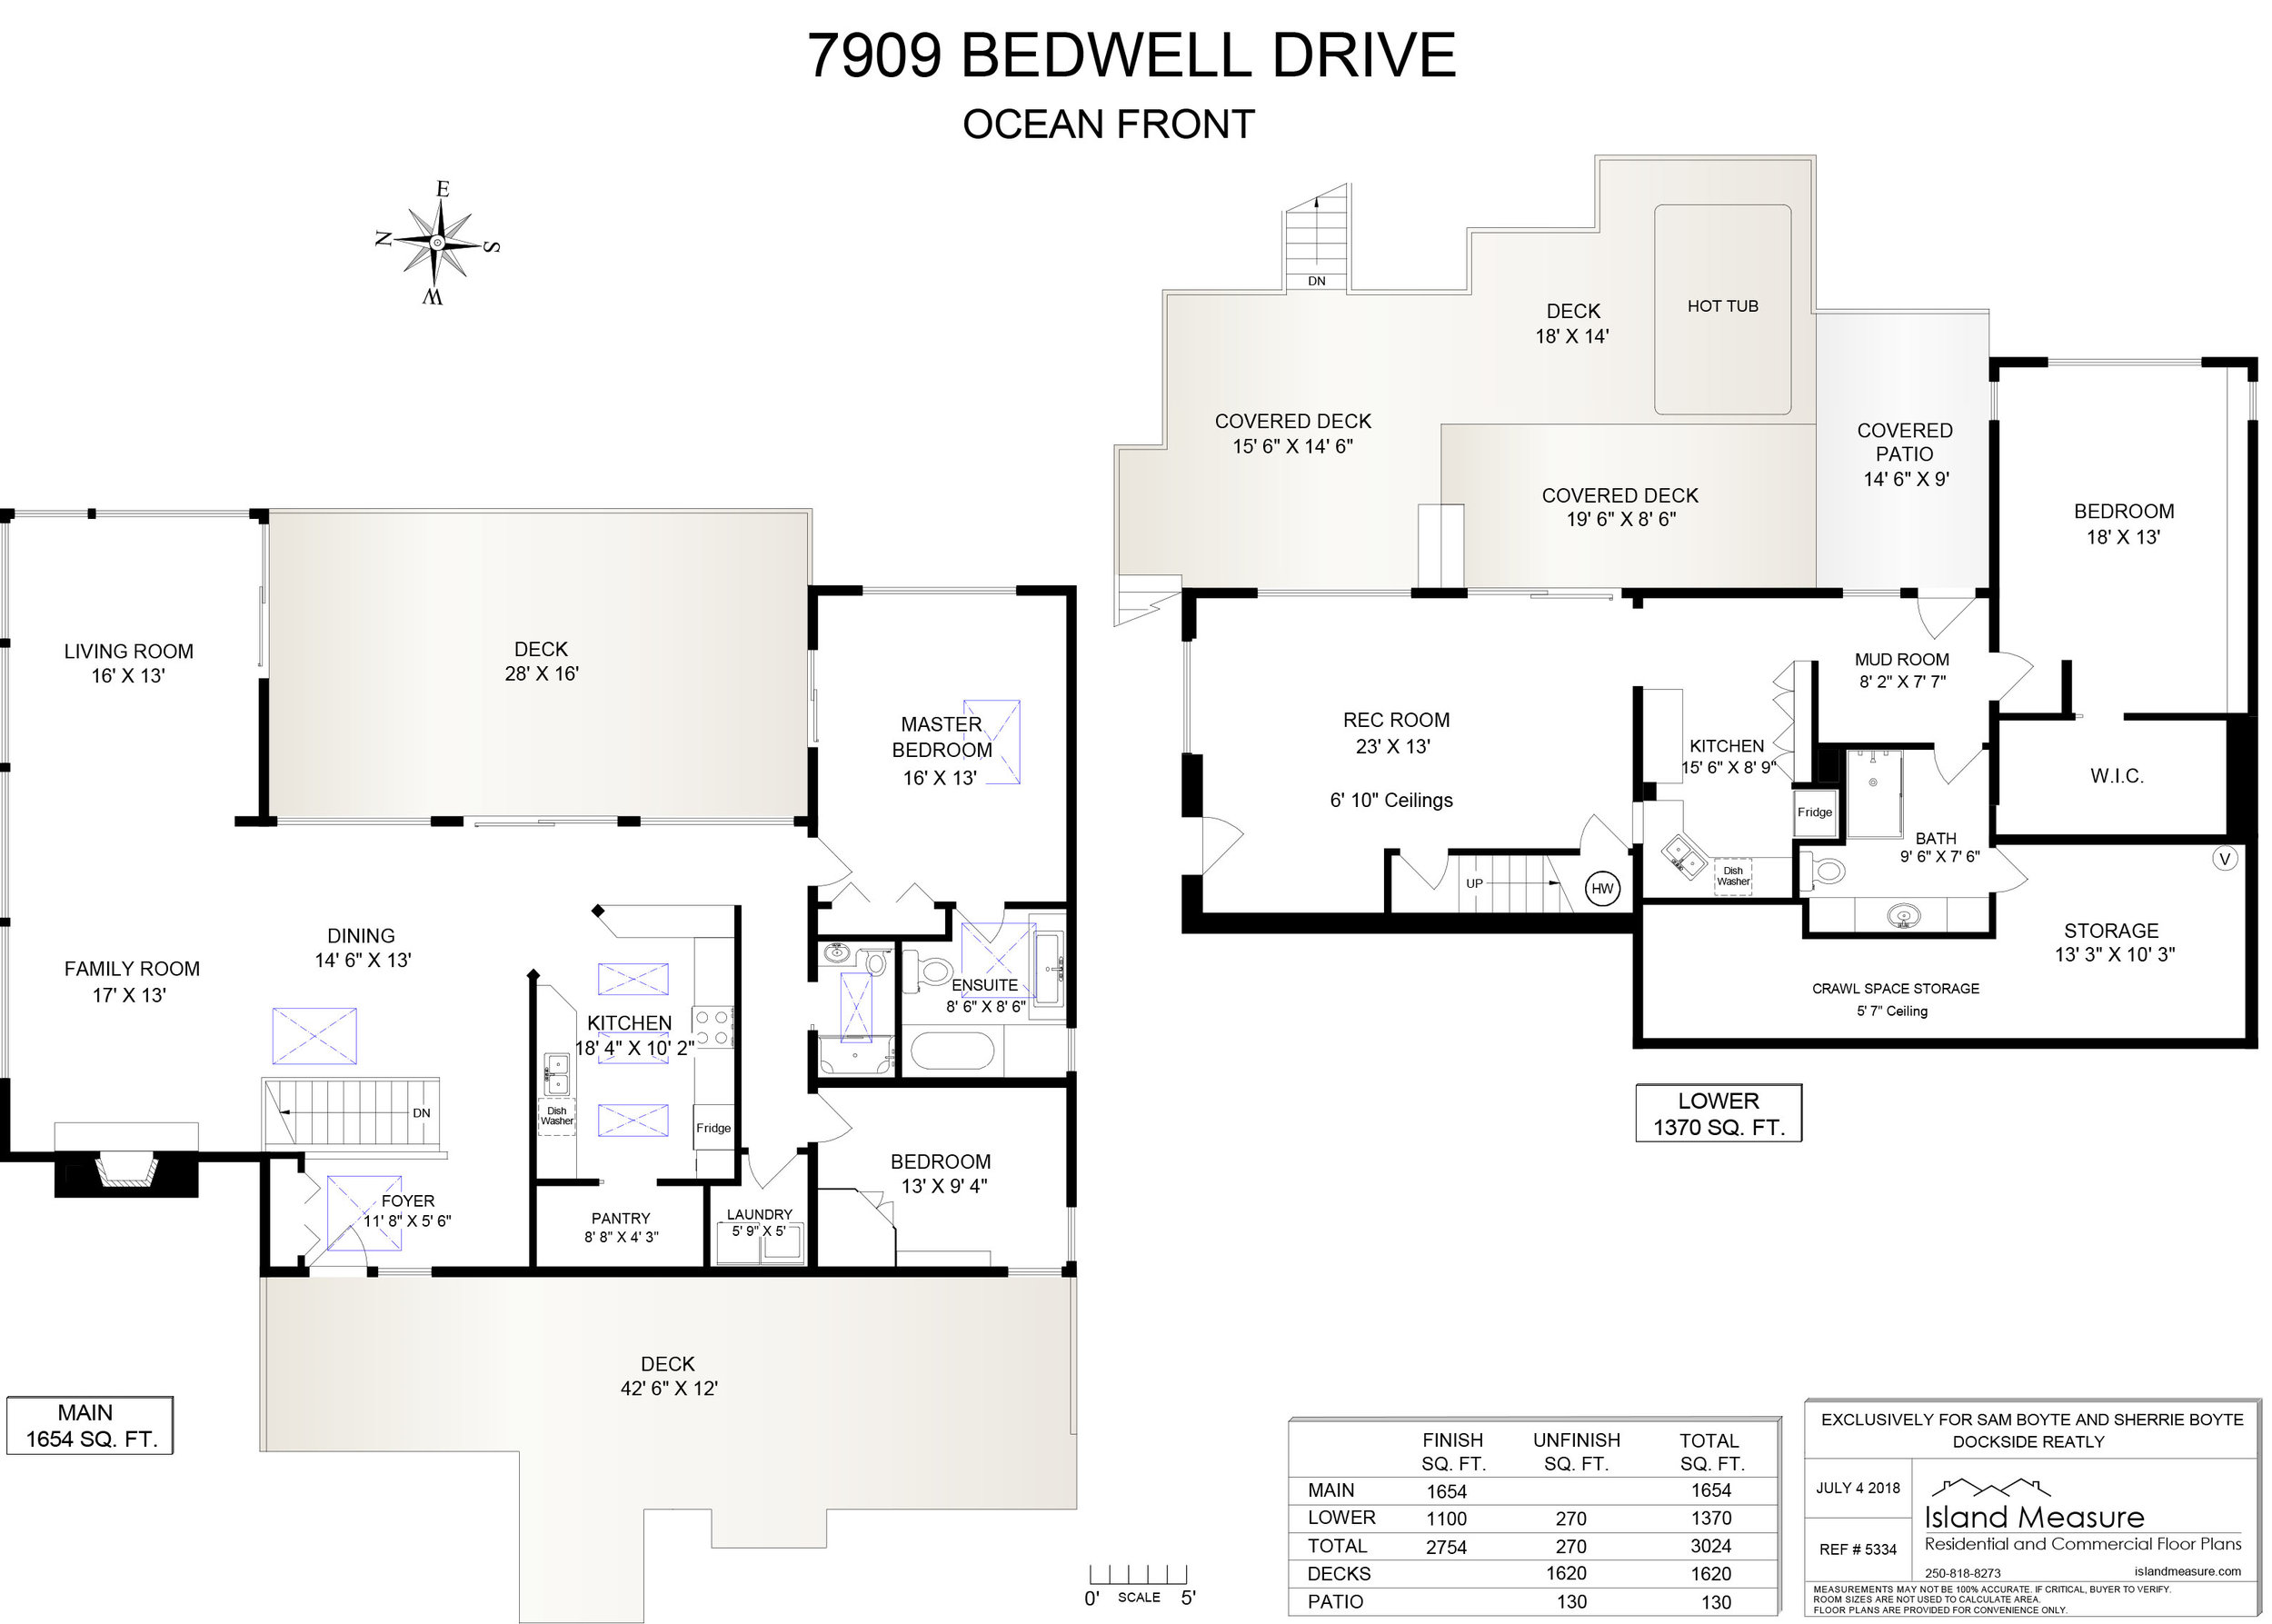 7909 Bedwell DriveFP.jpg